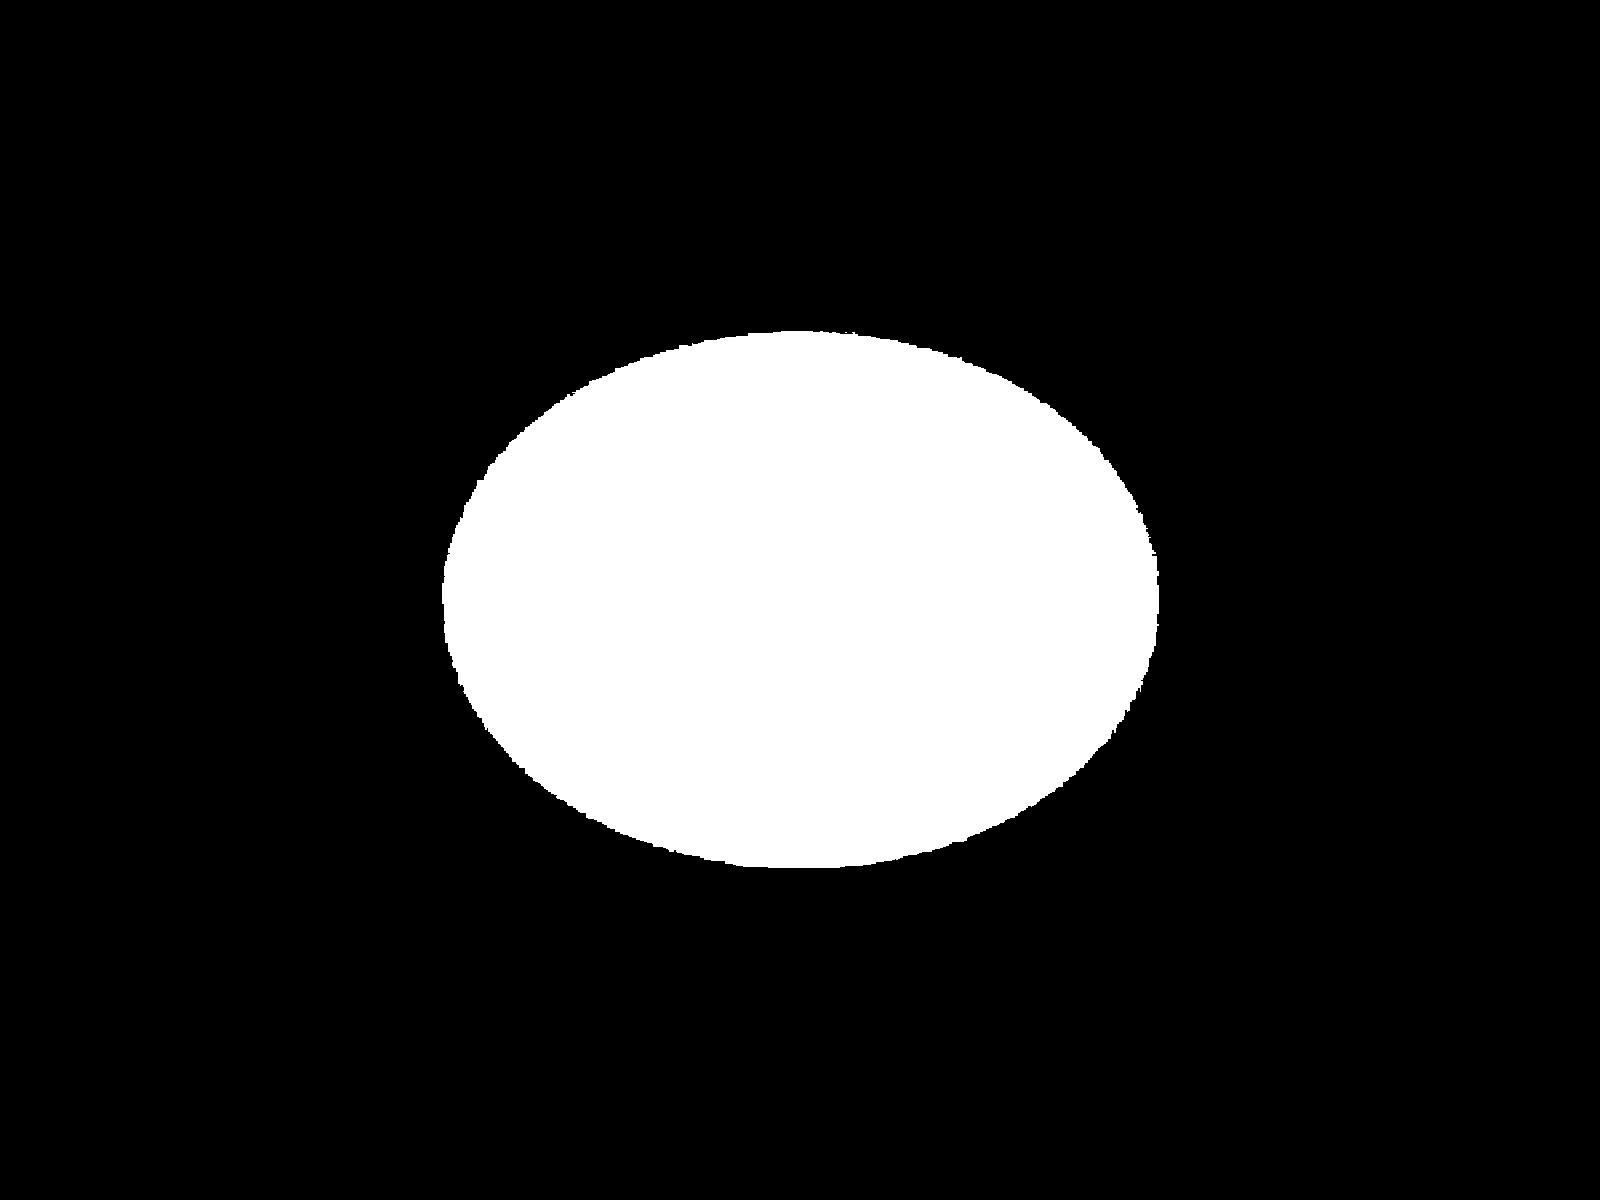 Click image for larger version.  Name:13 black oval vignette.png Views:33620 Size:179.1 KB ID:3680